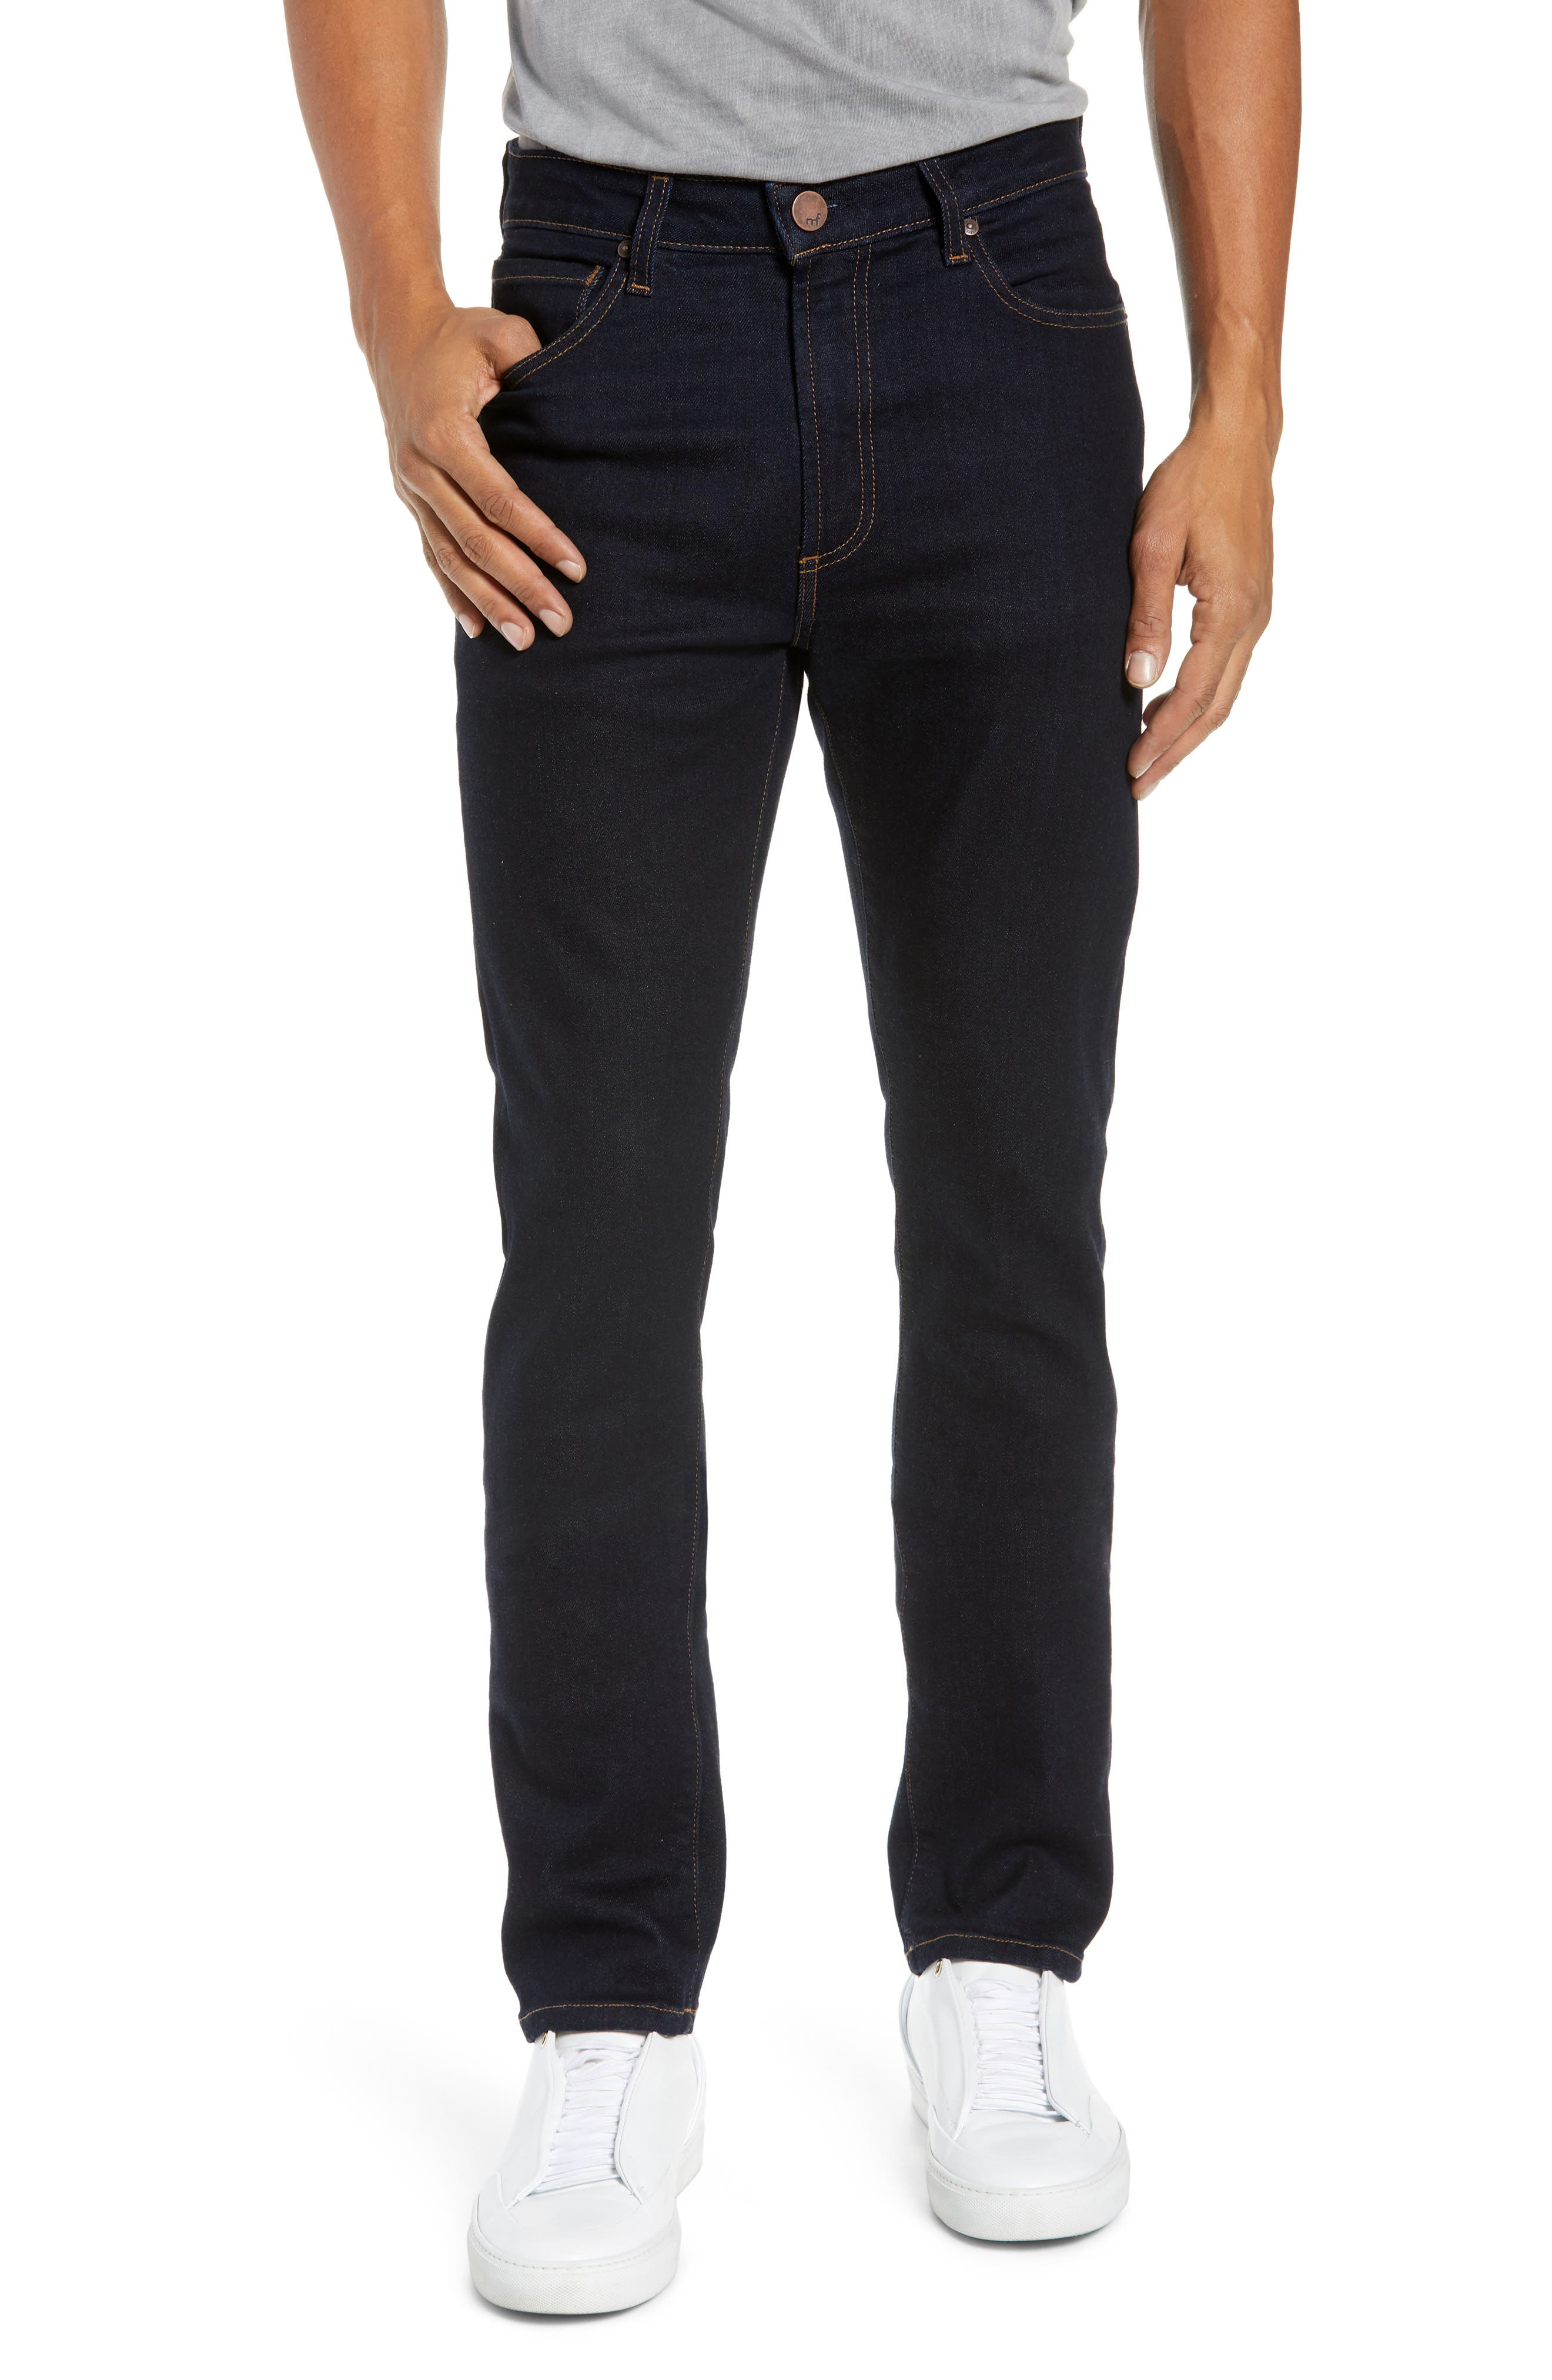 MONFRERE Brando Slim Jeans in Indigo